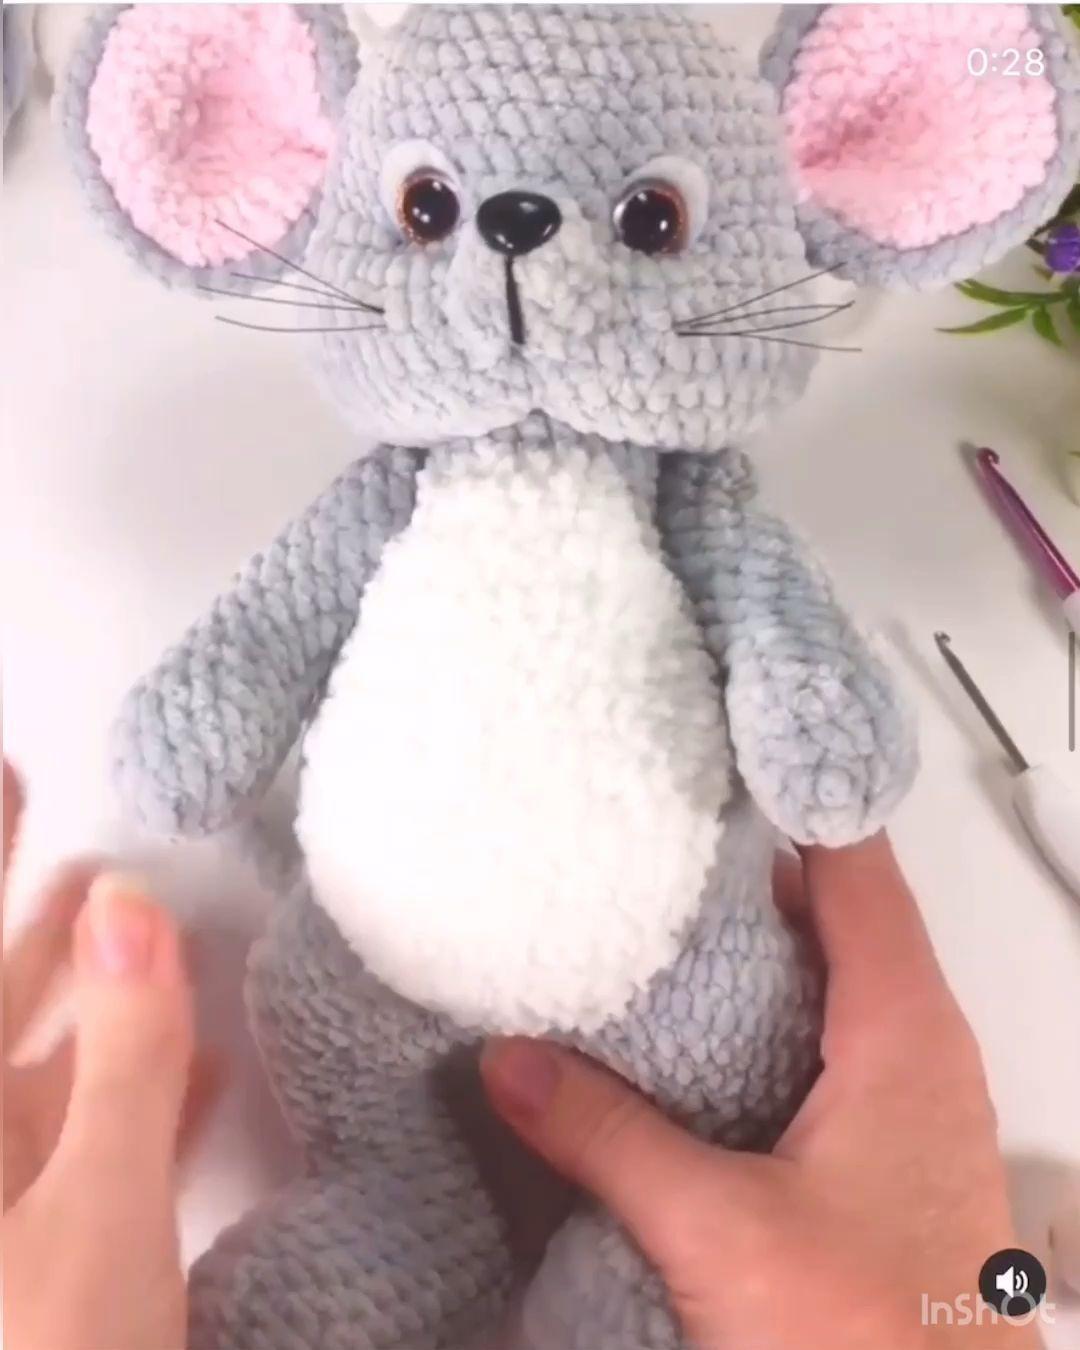 Miniature Yorkshire Terrier - Crochet Dog - Micro Amigurumi ... | 1350x1080